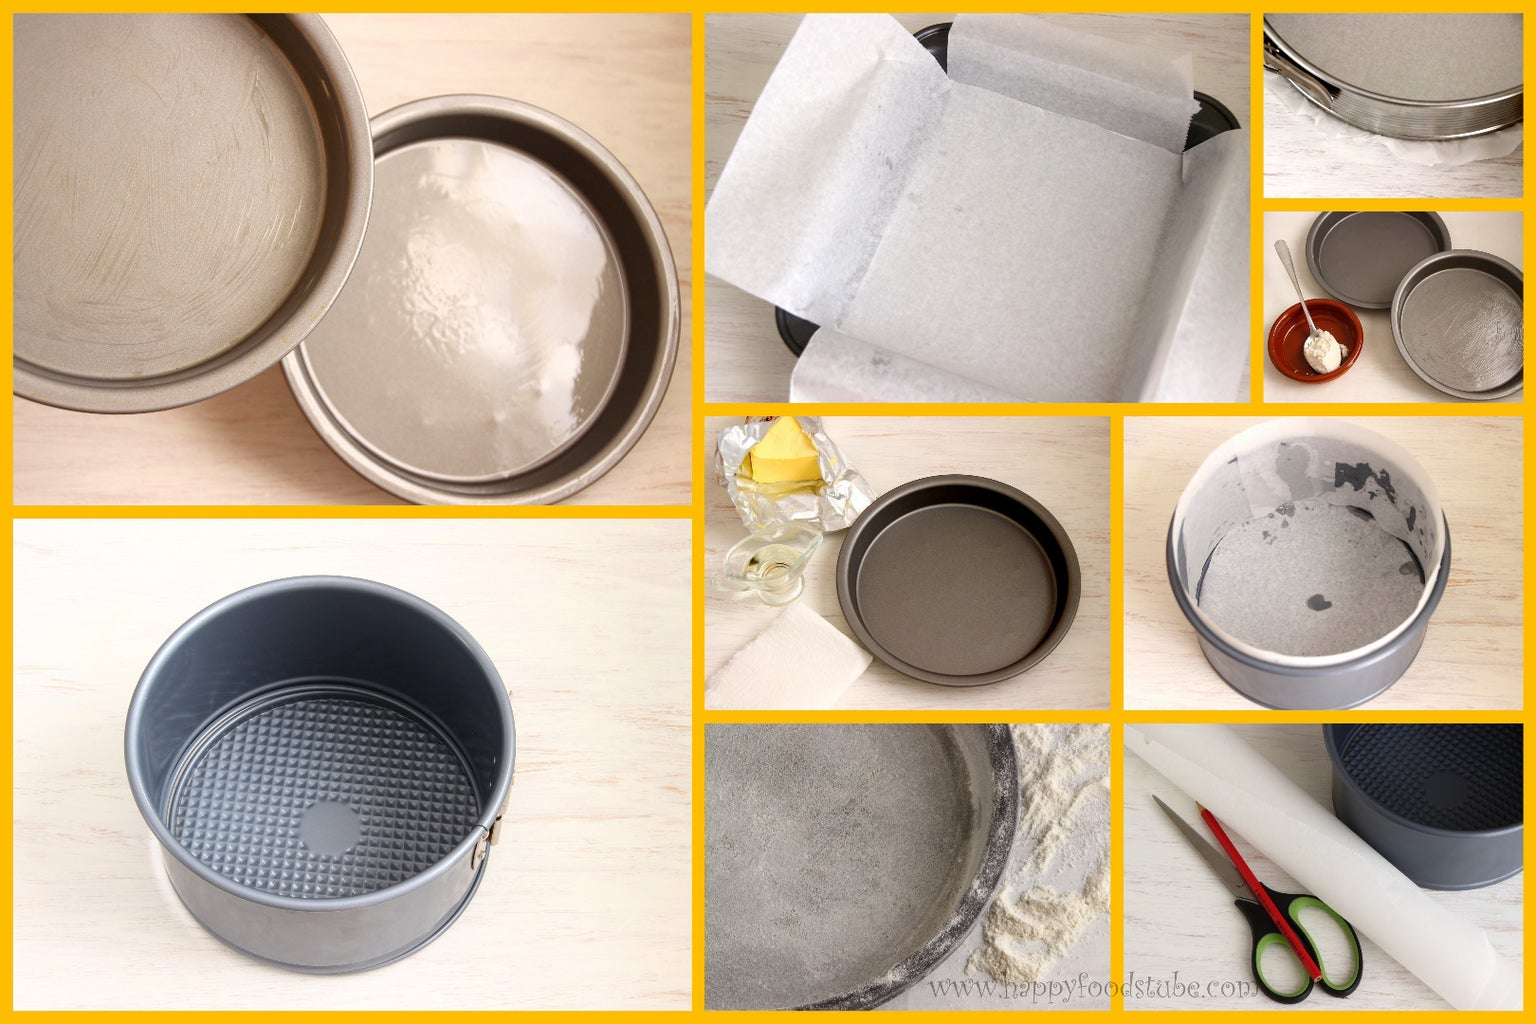 How to Prepare Cake Tins/Cake Pans